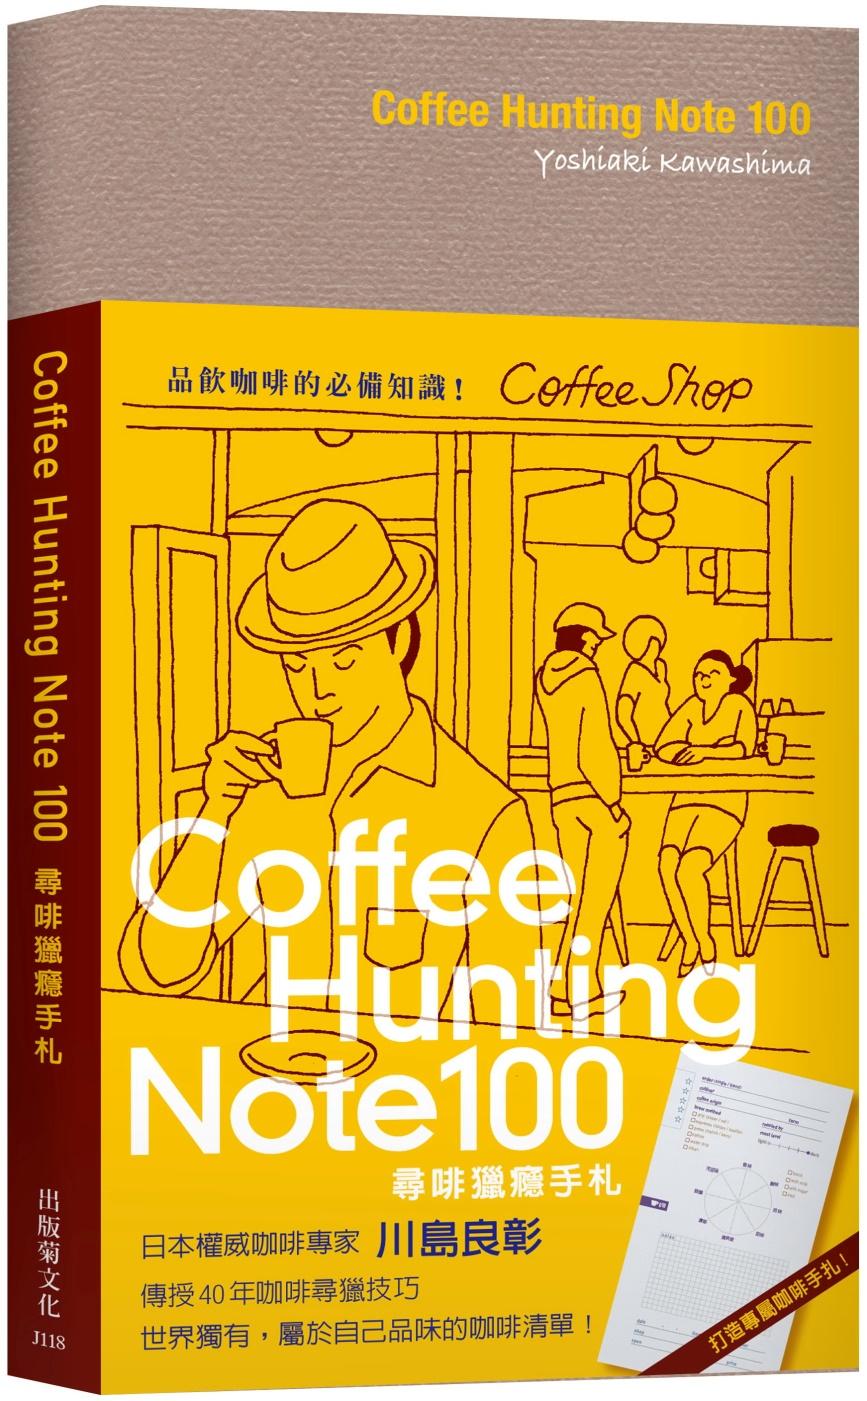 Coffee Hunting Note 100 尋啡獵癮手札:日本權威咖啡專家傳授40年咖啡尋獵技巧,世界獨有屬於自己品味的咖啡清單!